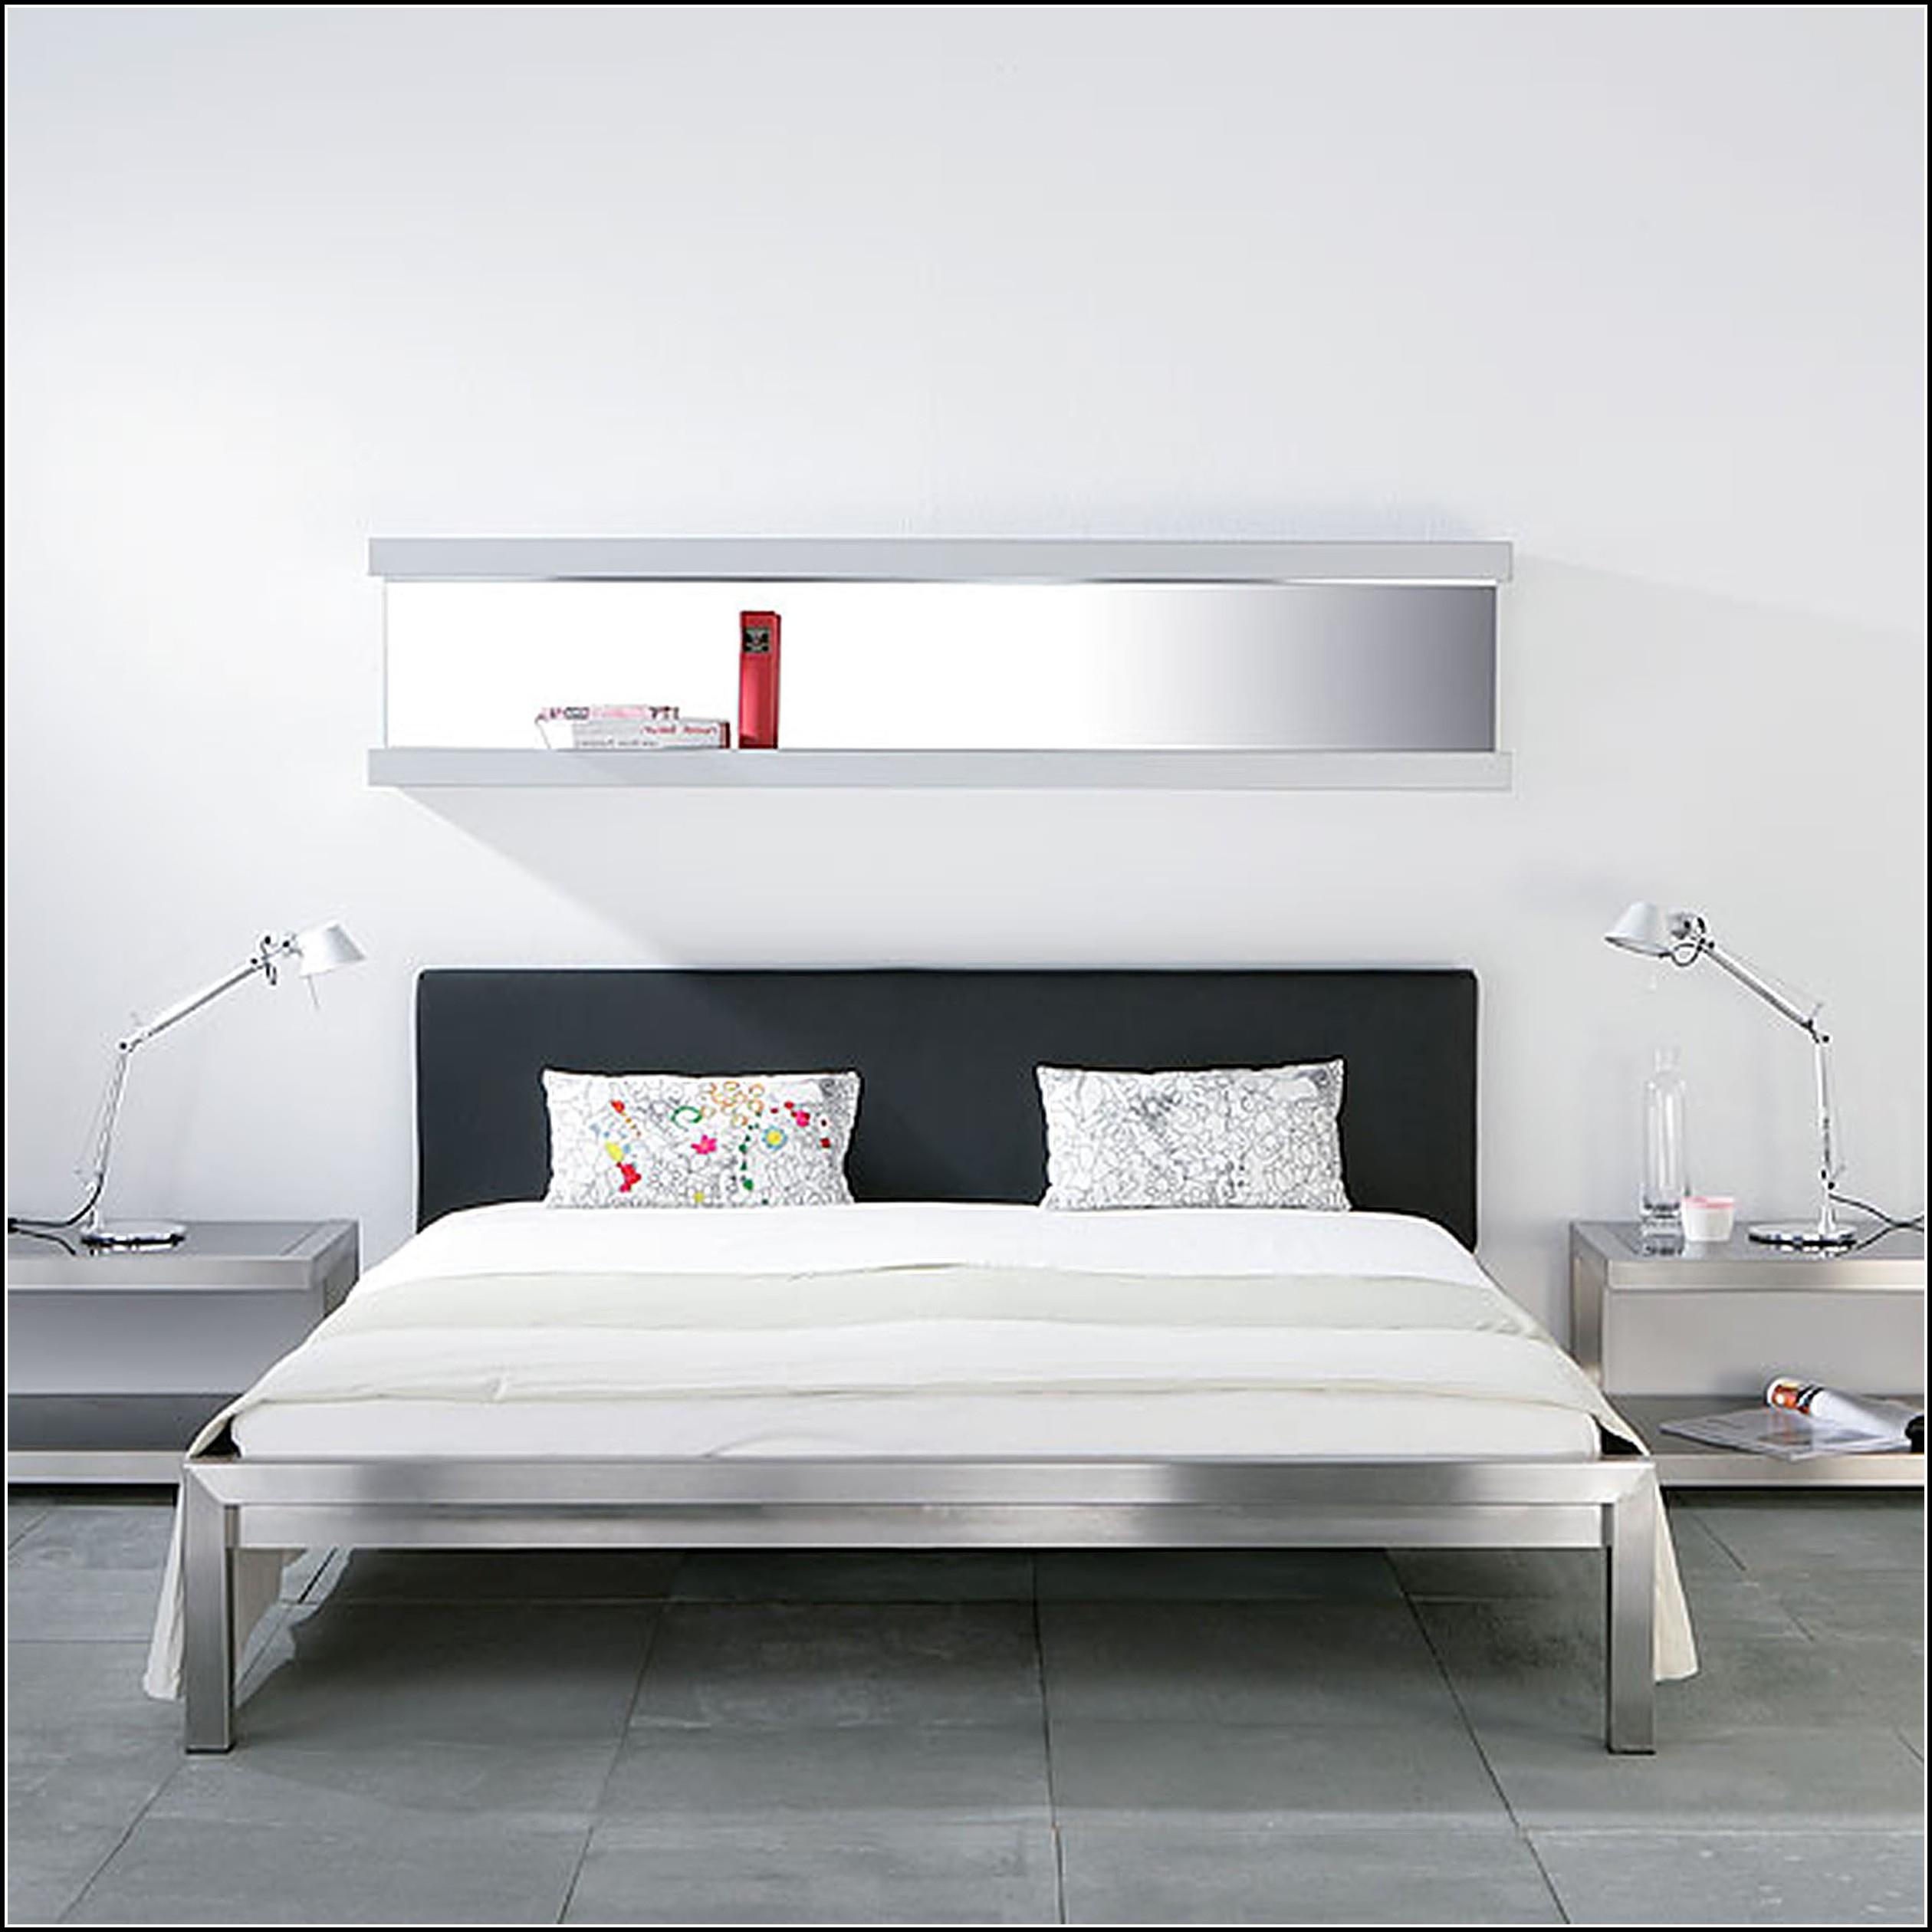 bett kopfteil gepolstert betten house und dekor. Black Bedroom Furniture Sets. Home Design Ideas